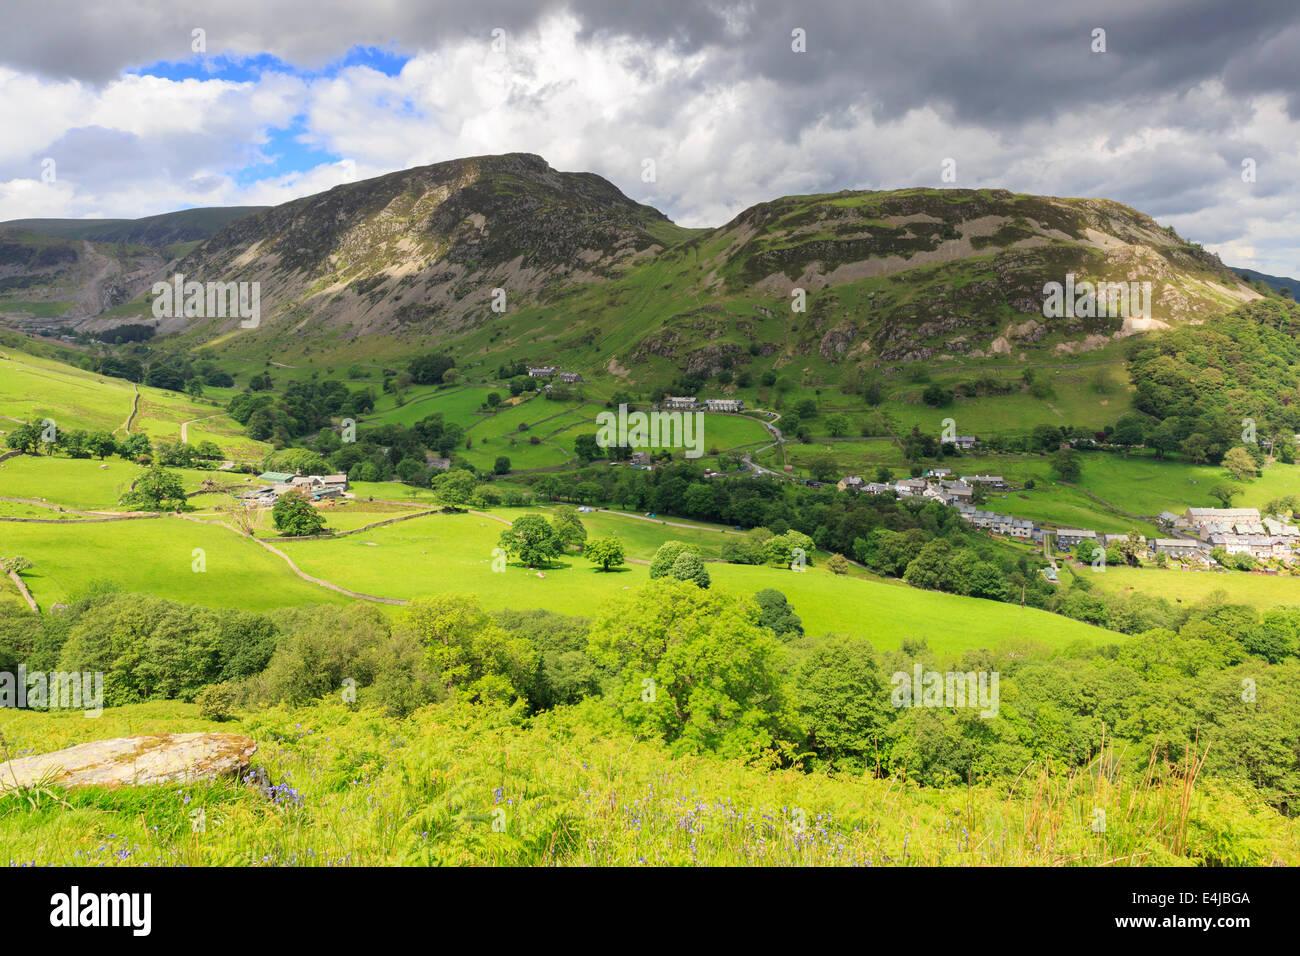 Sheffield Pike and Glenridding Dodd above Glenridding, Lake District, Cumbria - Stock Image